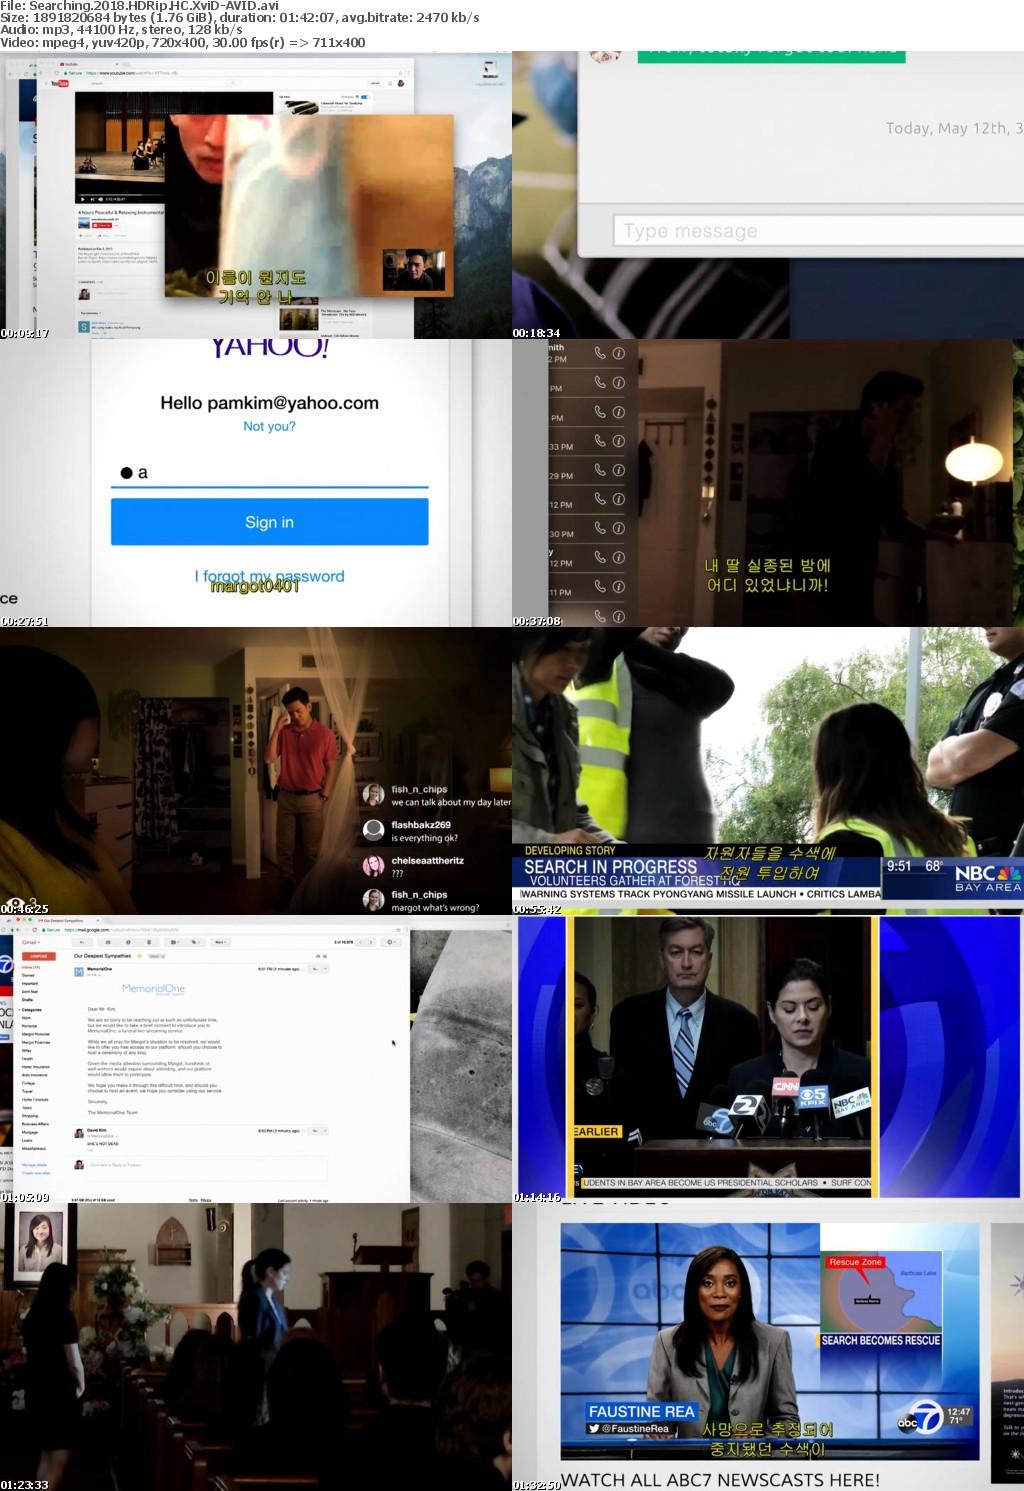 Searching (2018) HDRip HC XviD-AVID